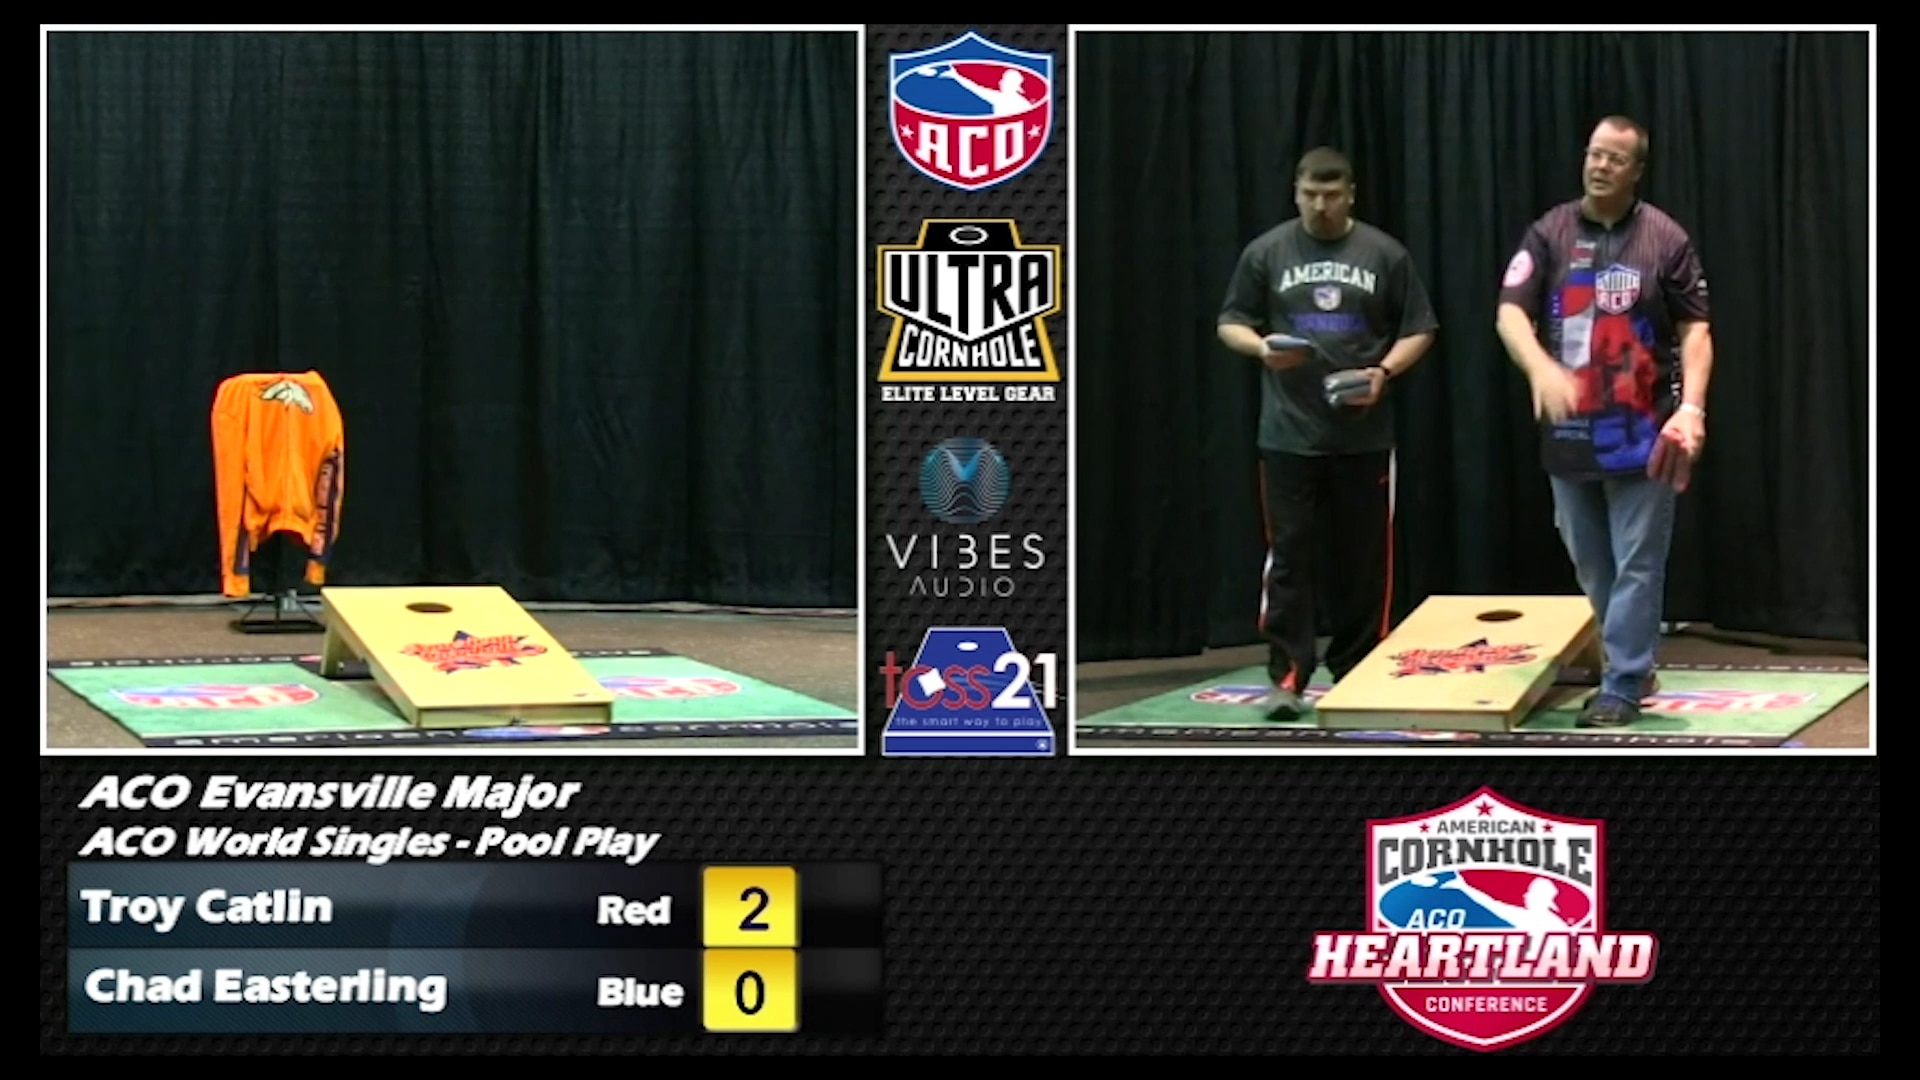 Evansville 13 Singles Pool   Troy Catlin vs Chad Easterling aco 1920x1080